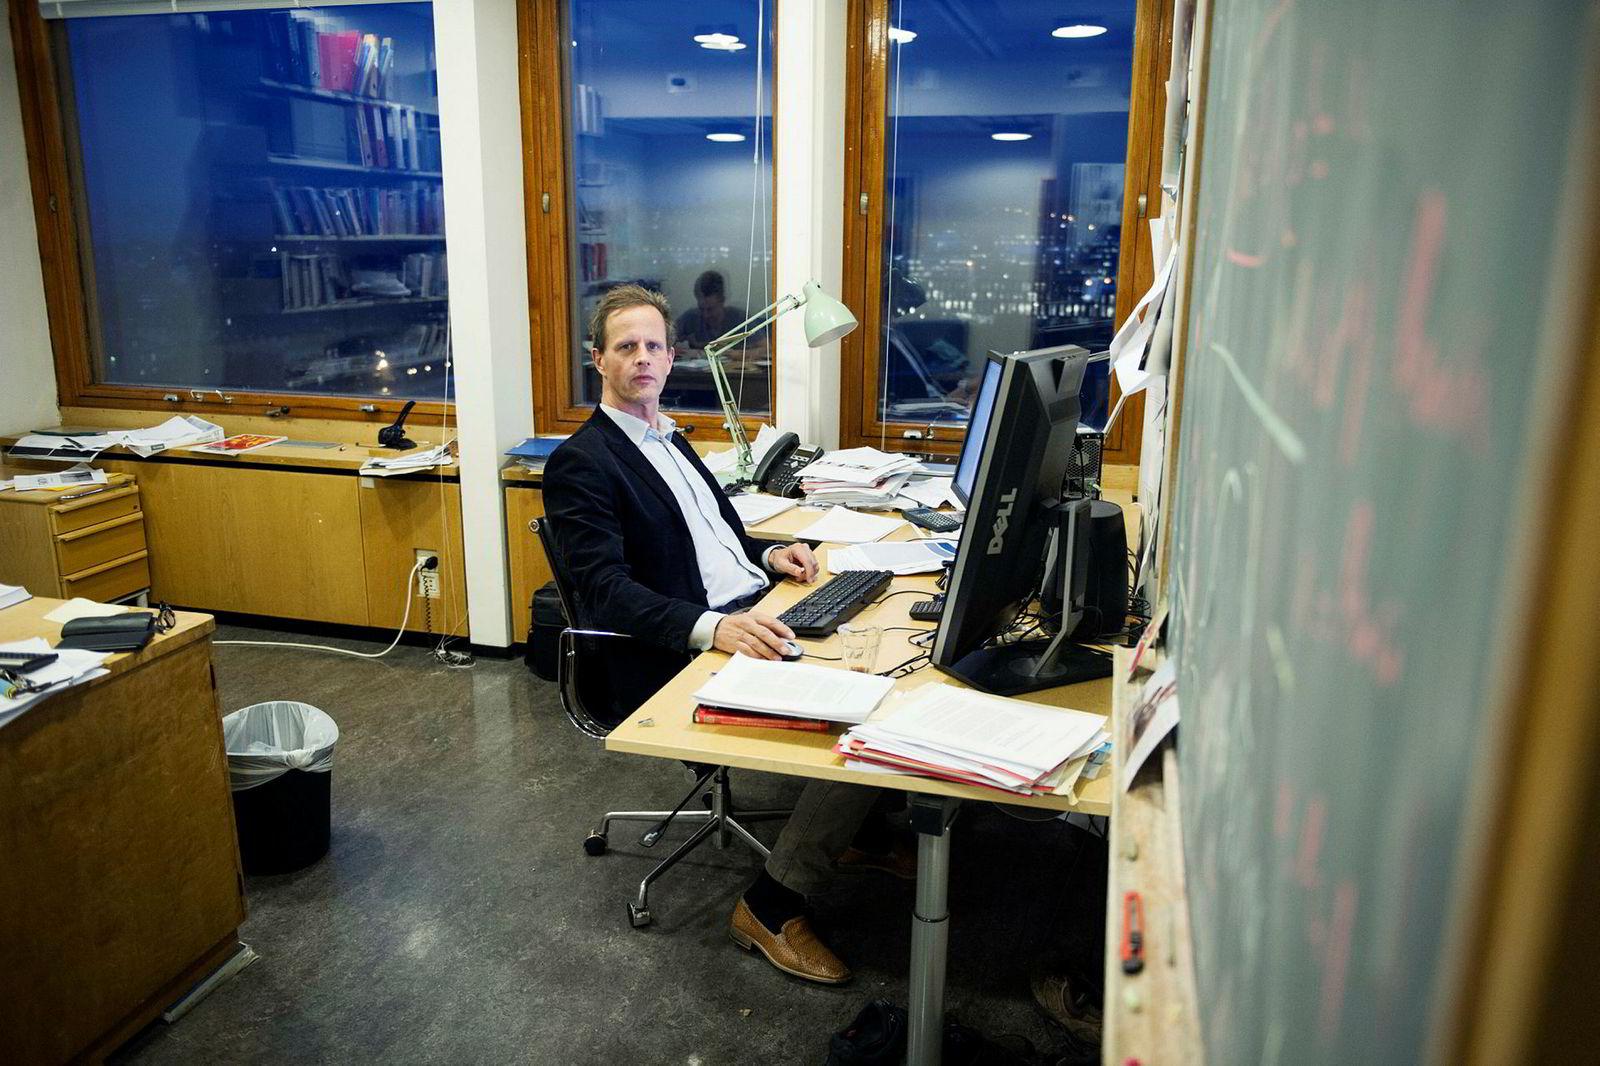 Økonomiprofessor Halvor Mehlum ved Universitetet i Oslo.